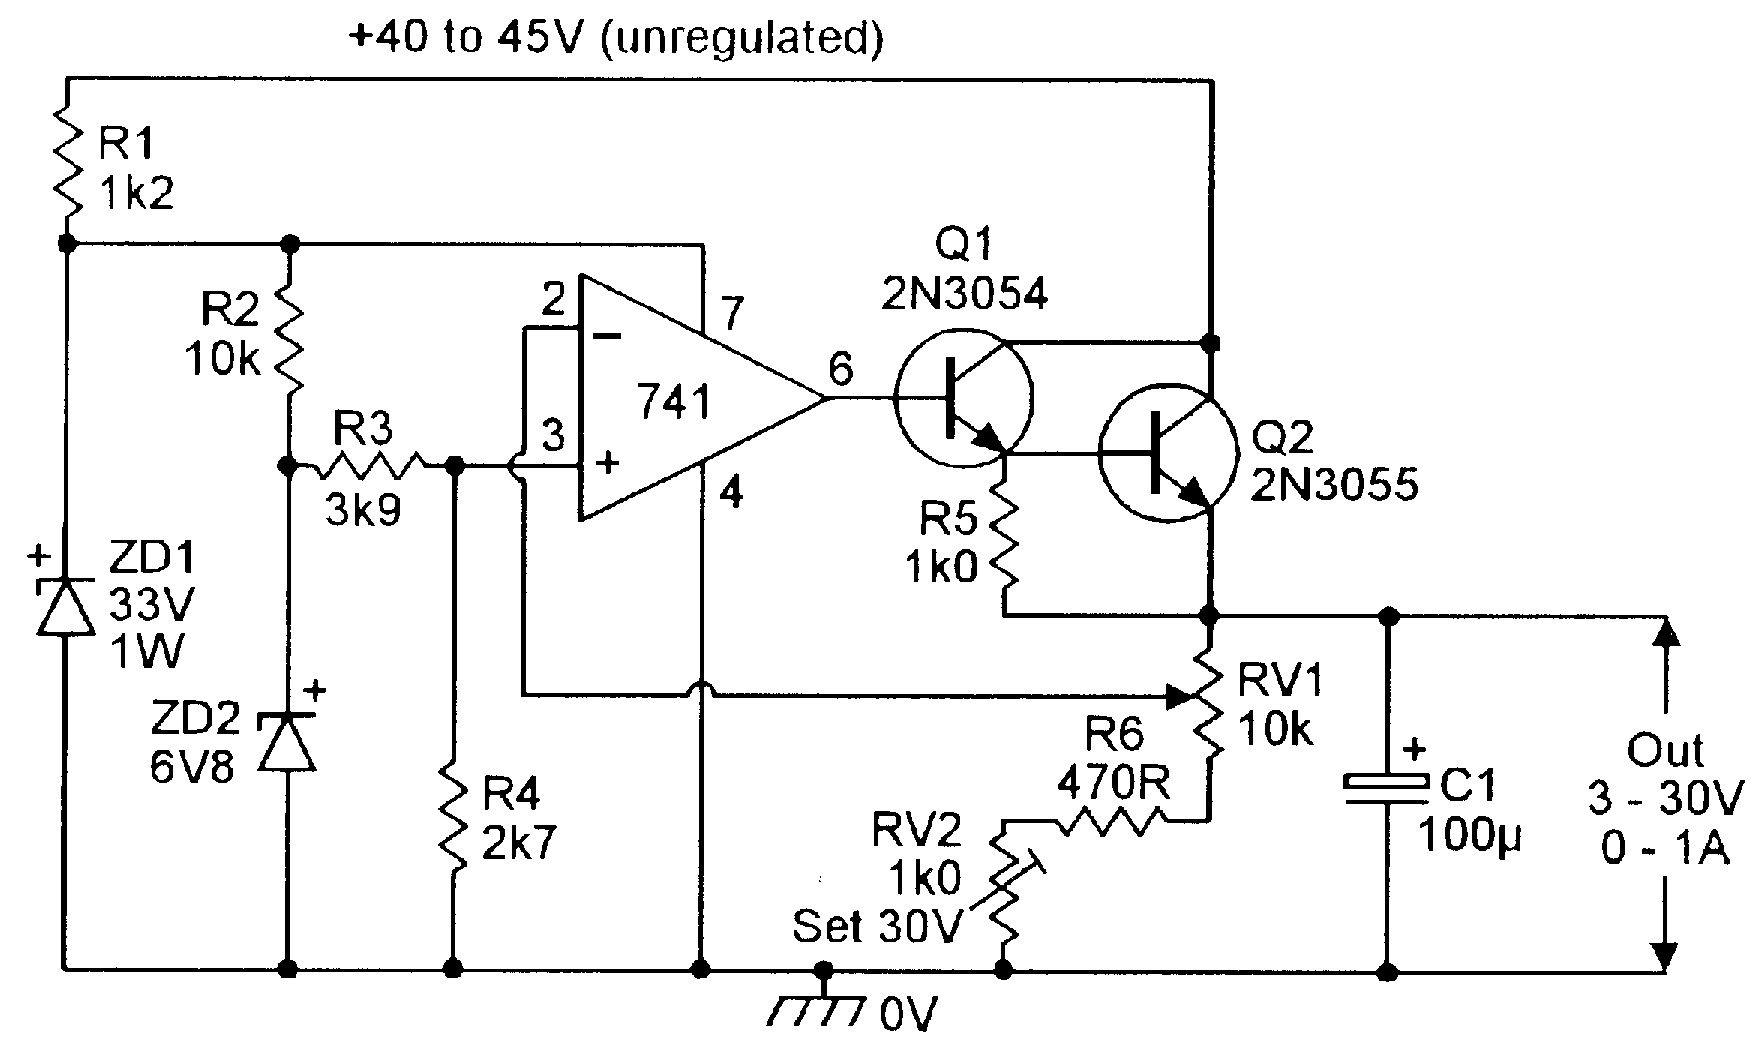 3v to 30v 0 to 1 amp stabilized psu electronic schematics 3v to 30v 0 to 1 amp stabilized psu pooptronica Gallery